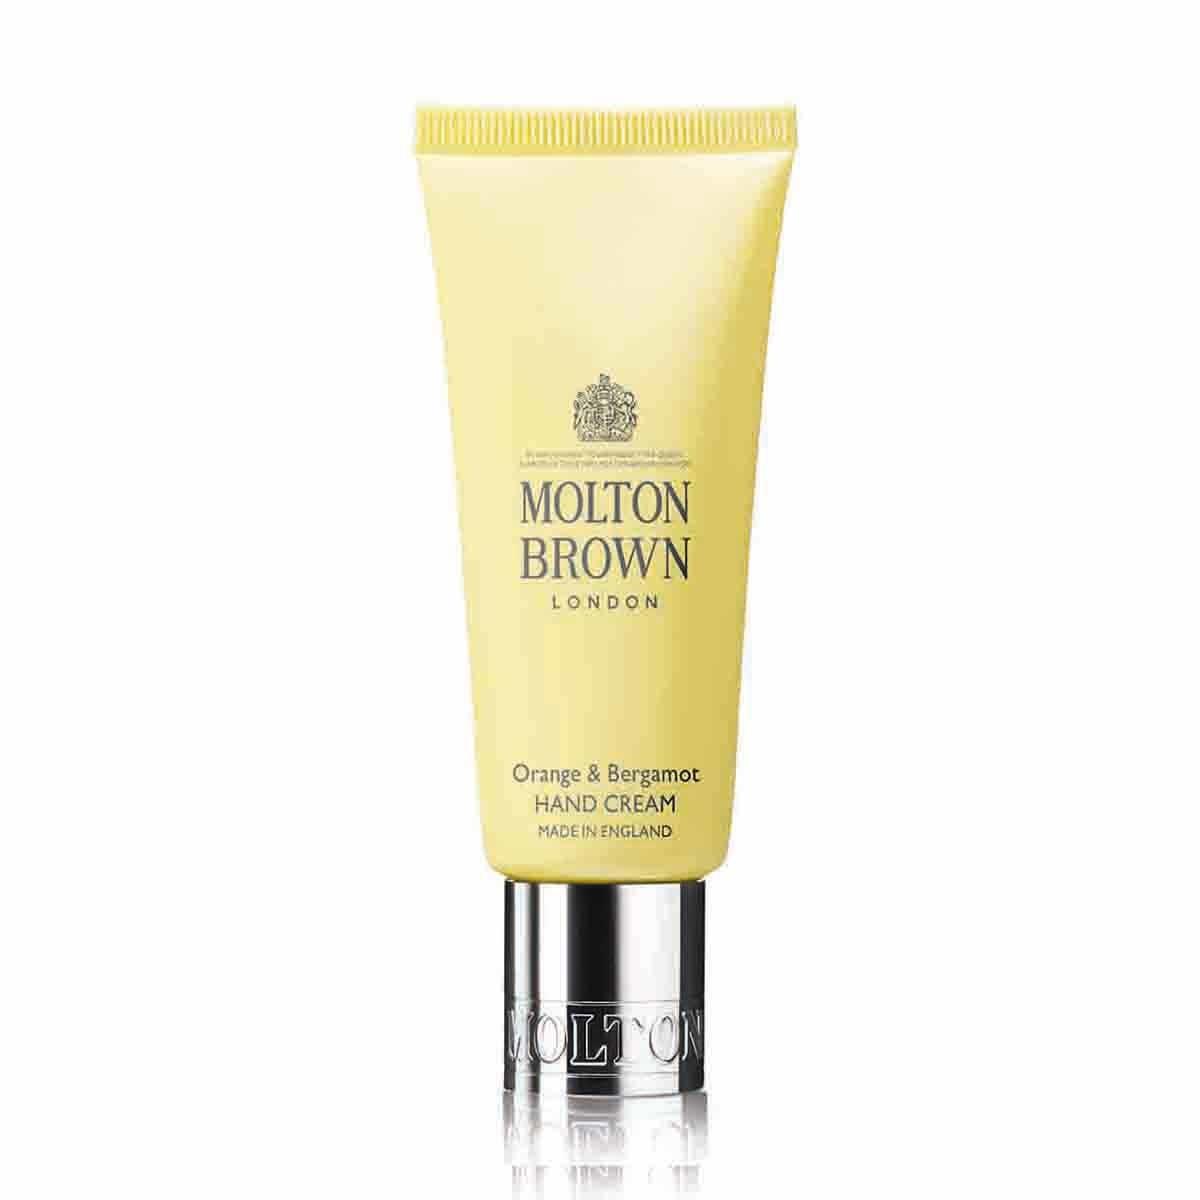 Molton Brown Orange & Bergamot  Hand Cream 40ml